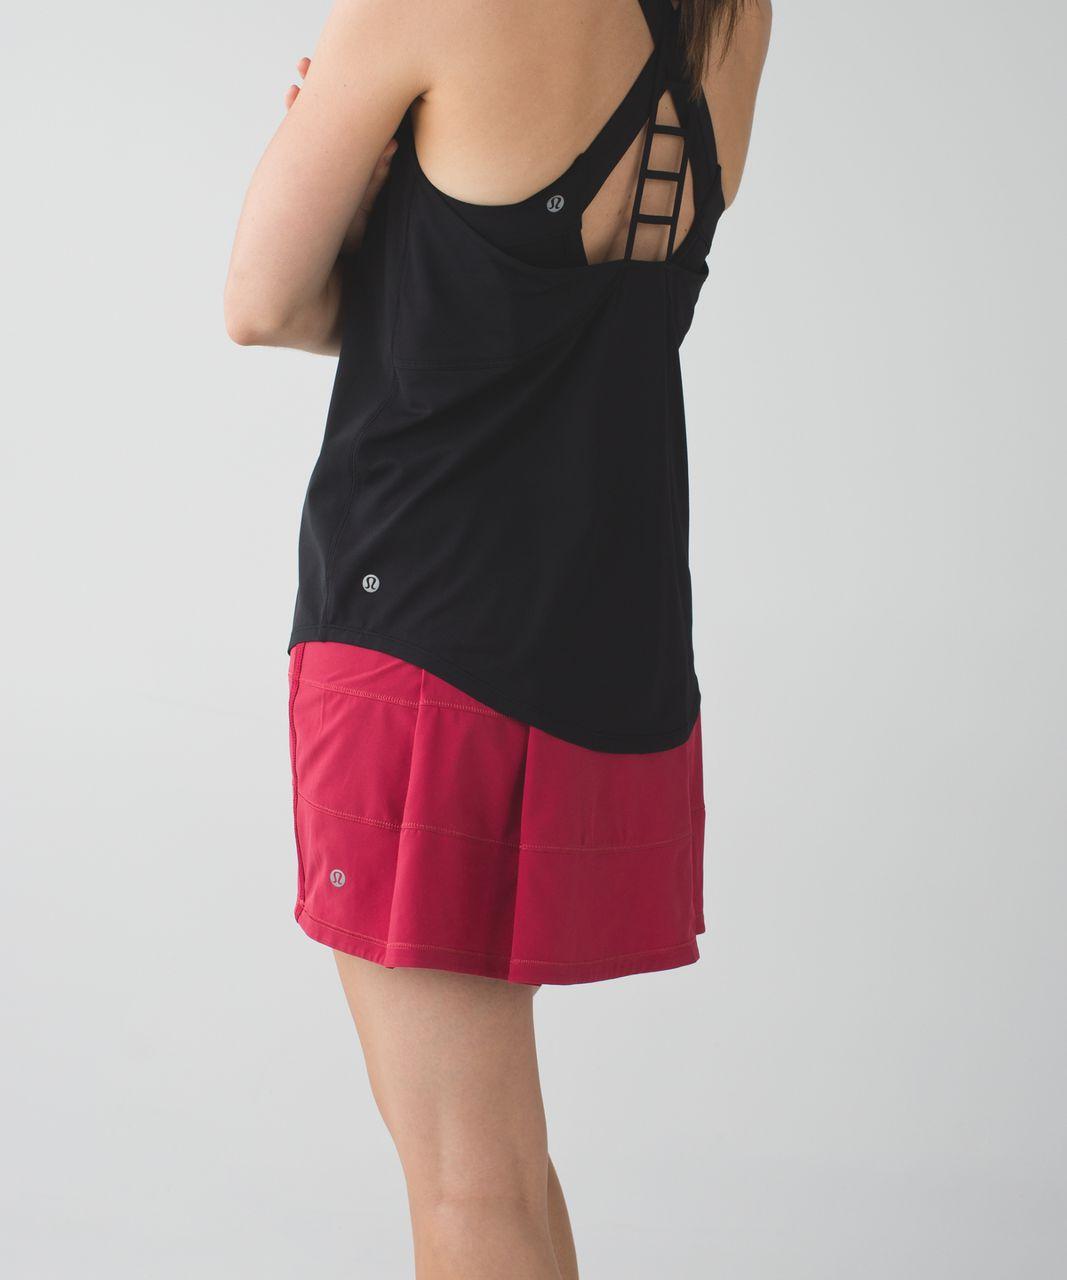 Lululemon Pace Rival Skirt II *4-way Stretch (Tall) - Cranberry / Mini Ziggy Snake Red Tide Cranberry